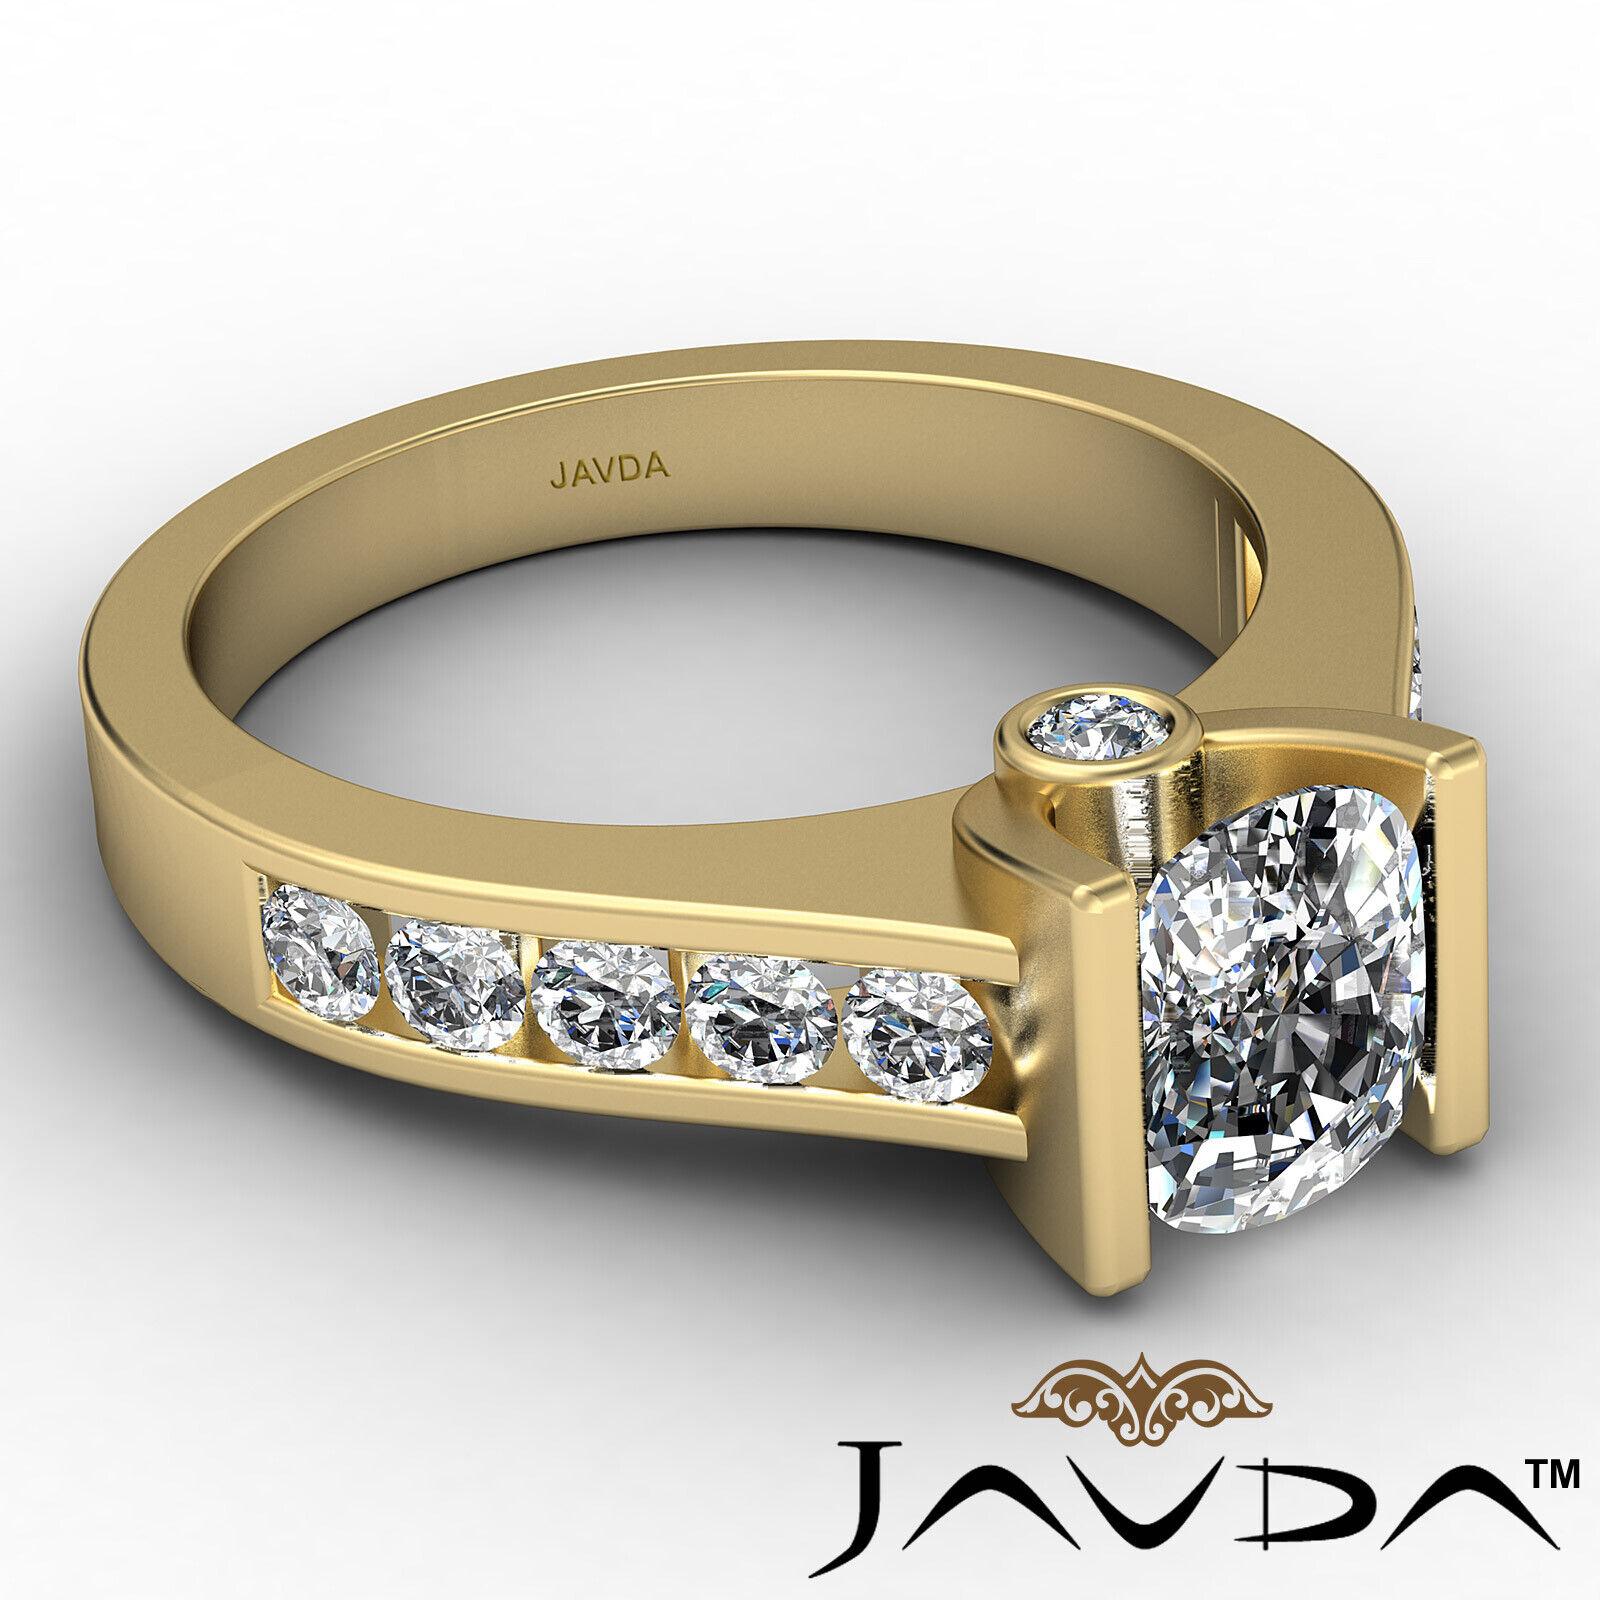 Bezel Cushion Diamond Engagement Women's Ring GIA, J Color SI1 clarity 1.53 ctw. 7